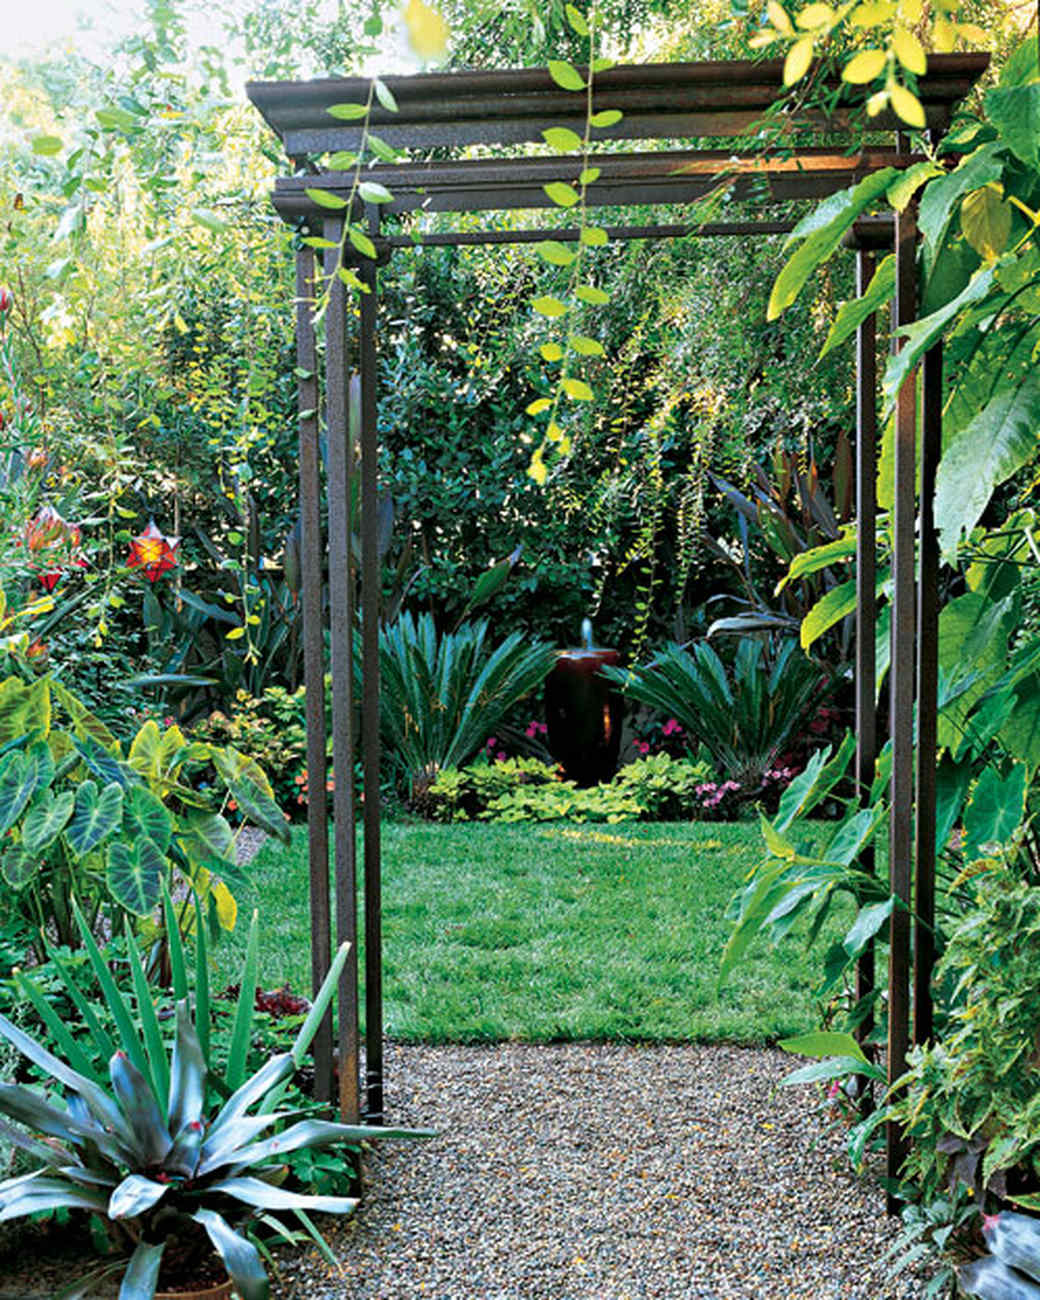 mla10351_sept2008_garden08.jpg